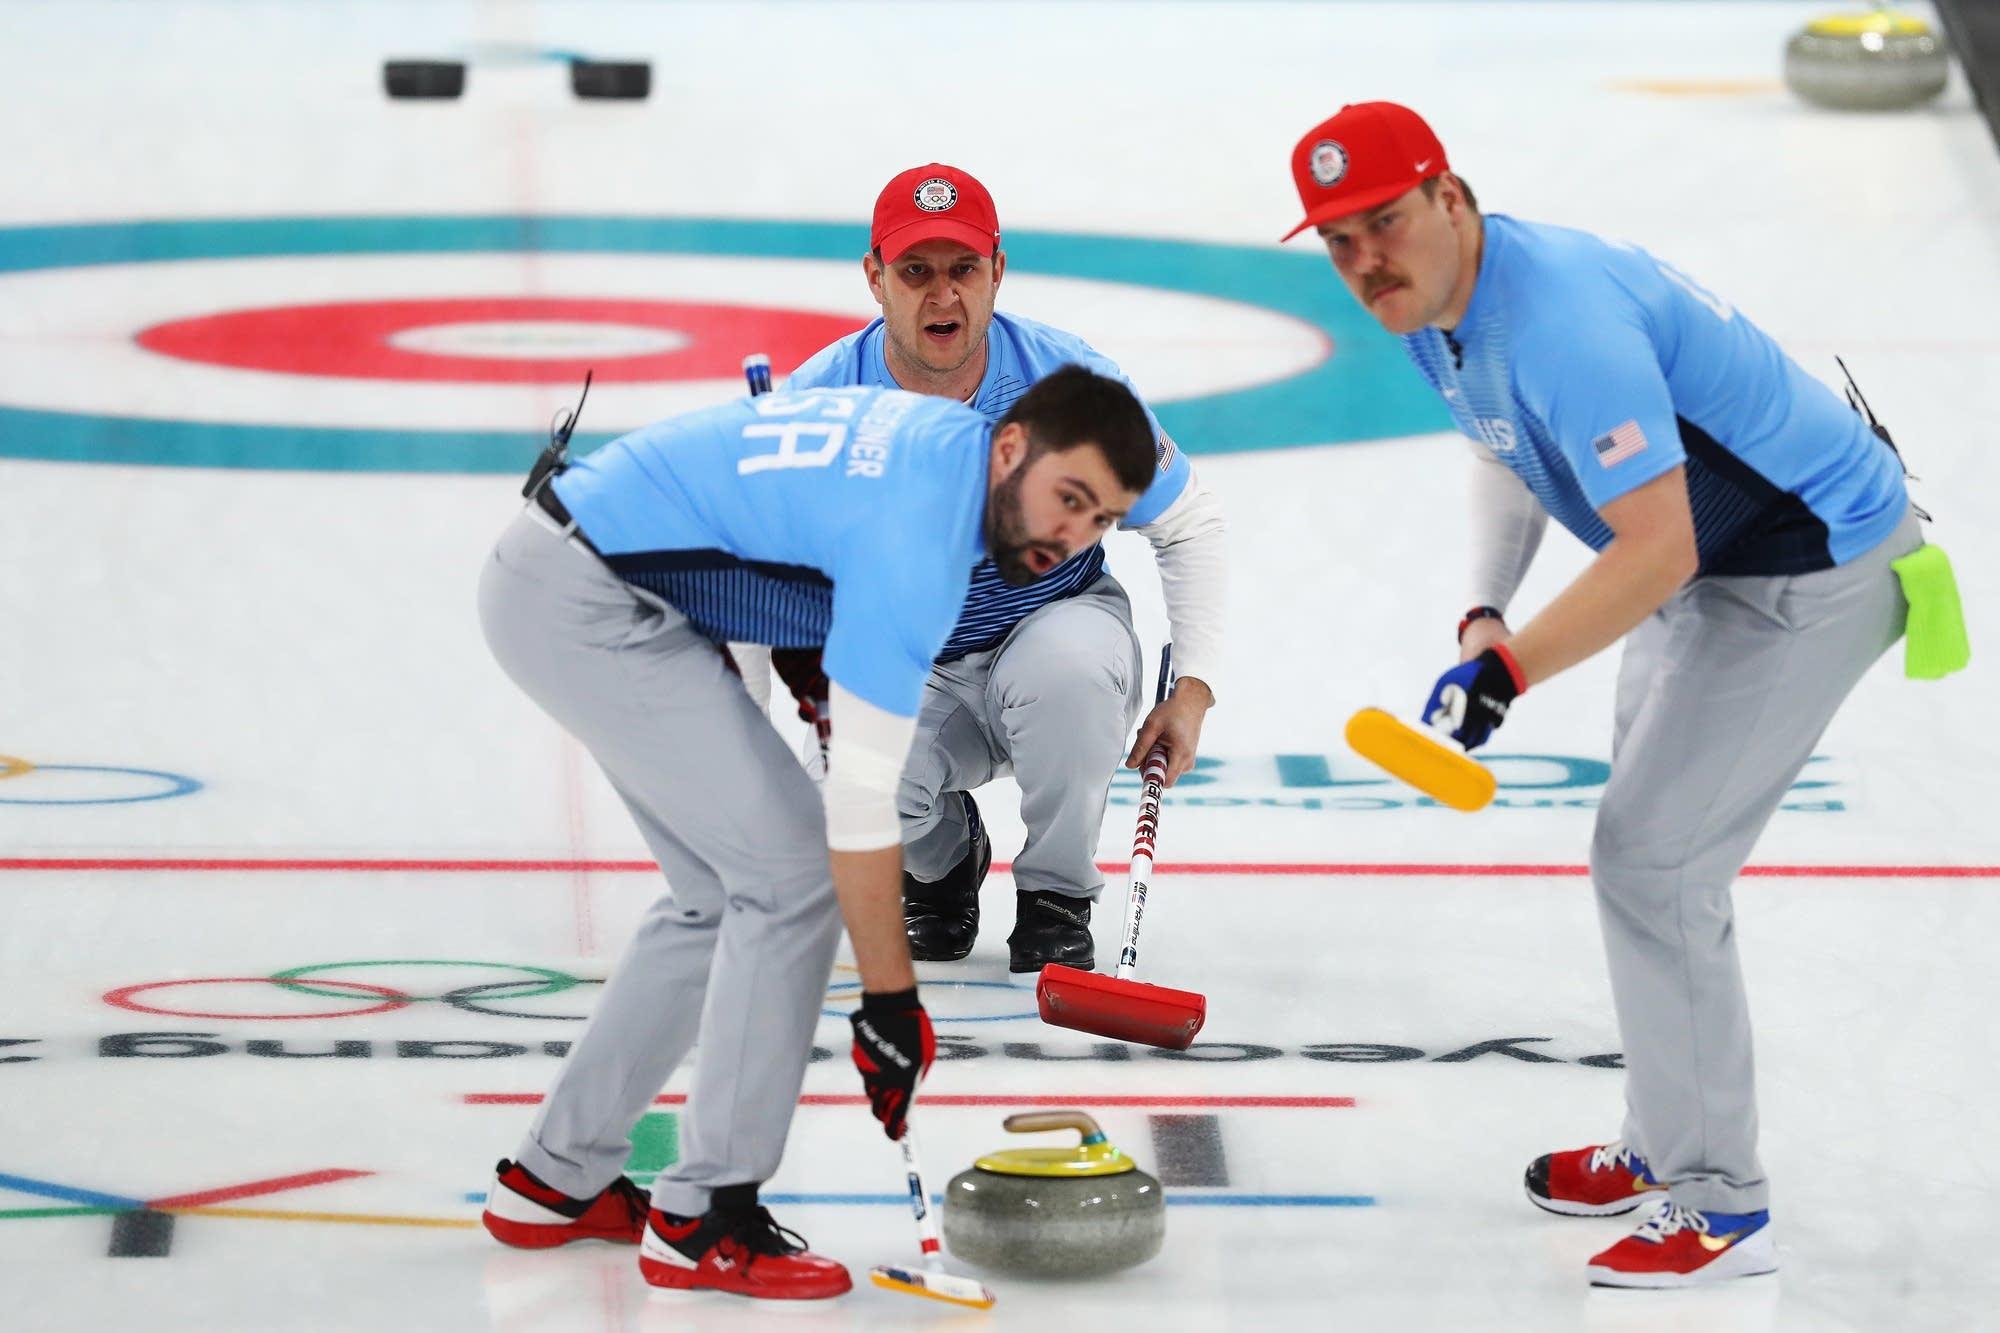 Curling Olympics 2018